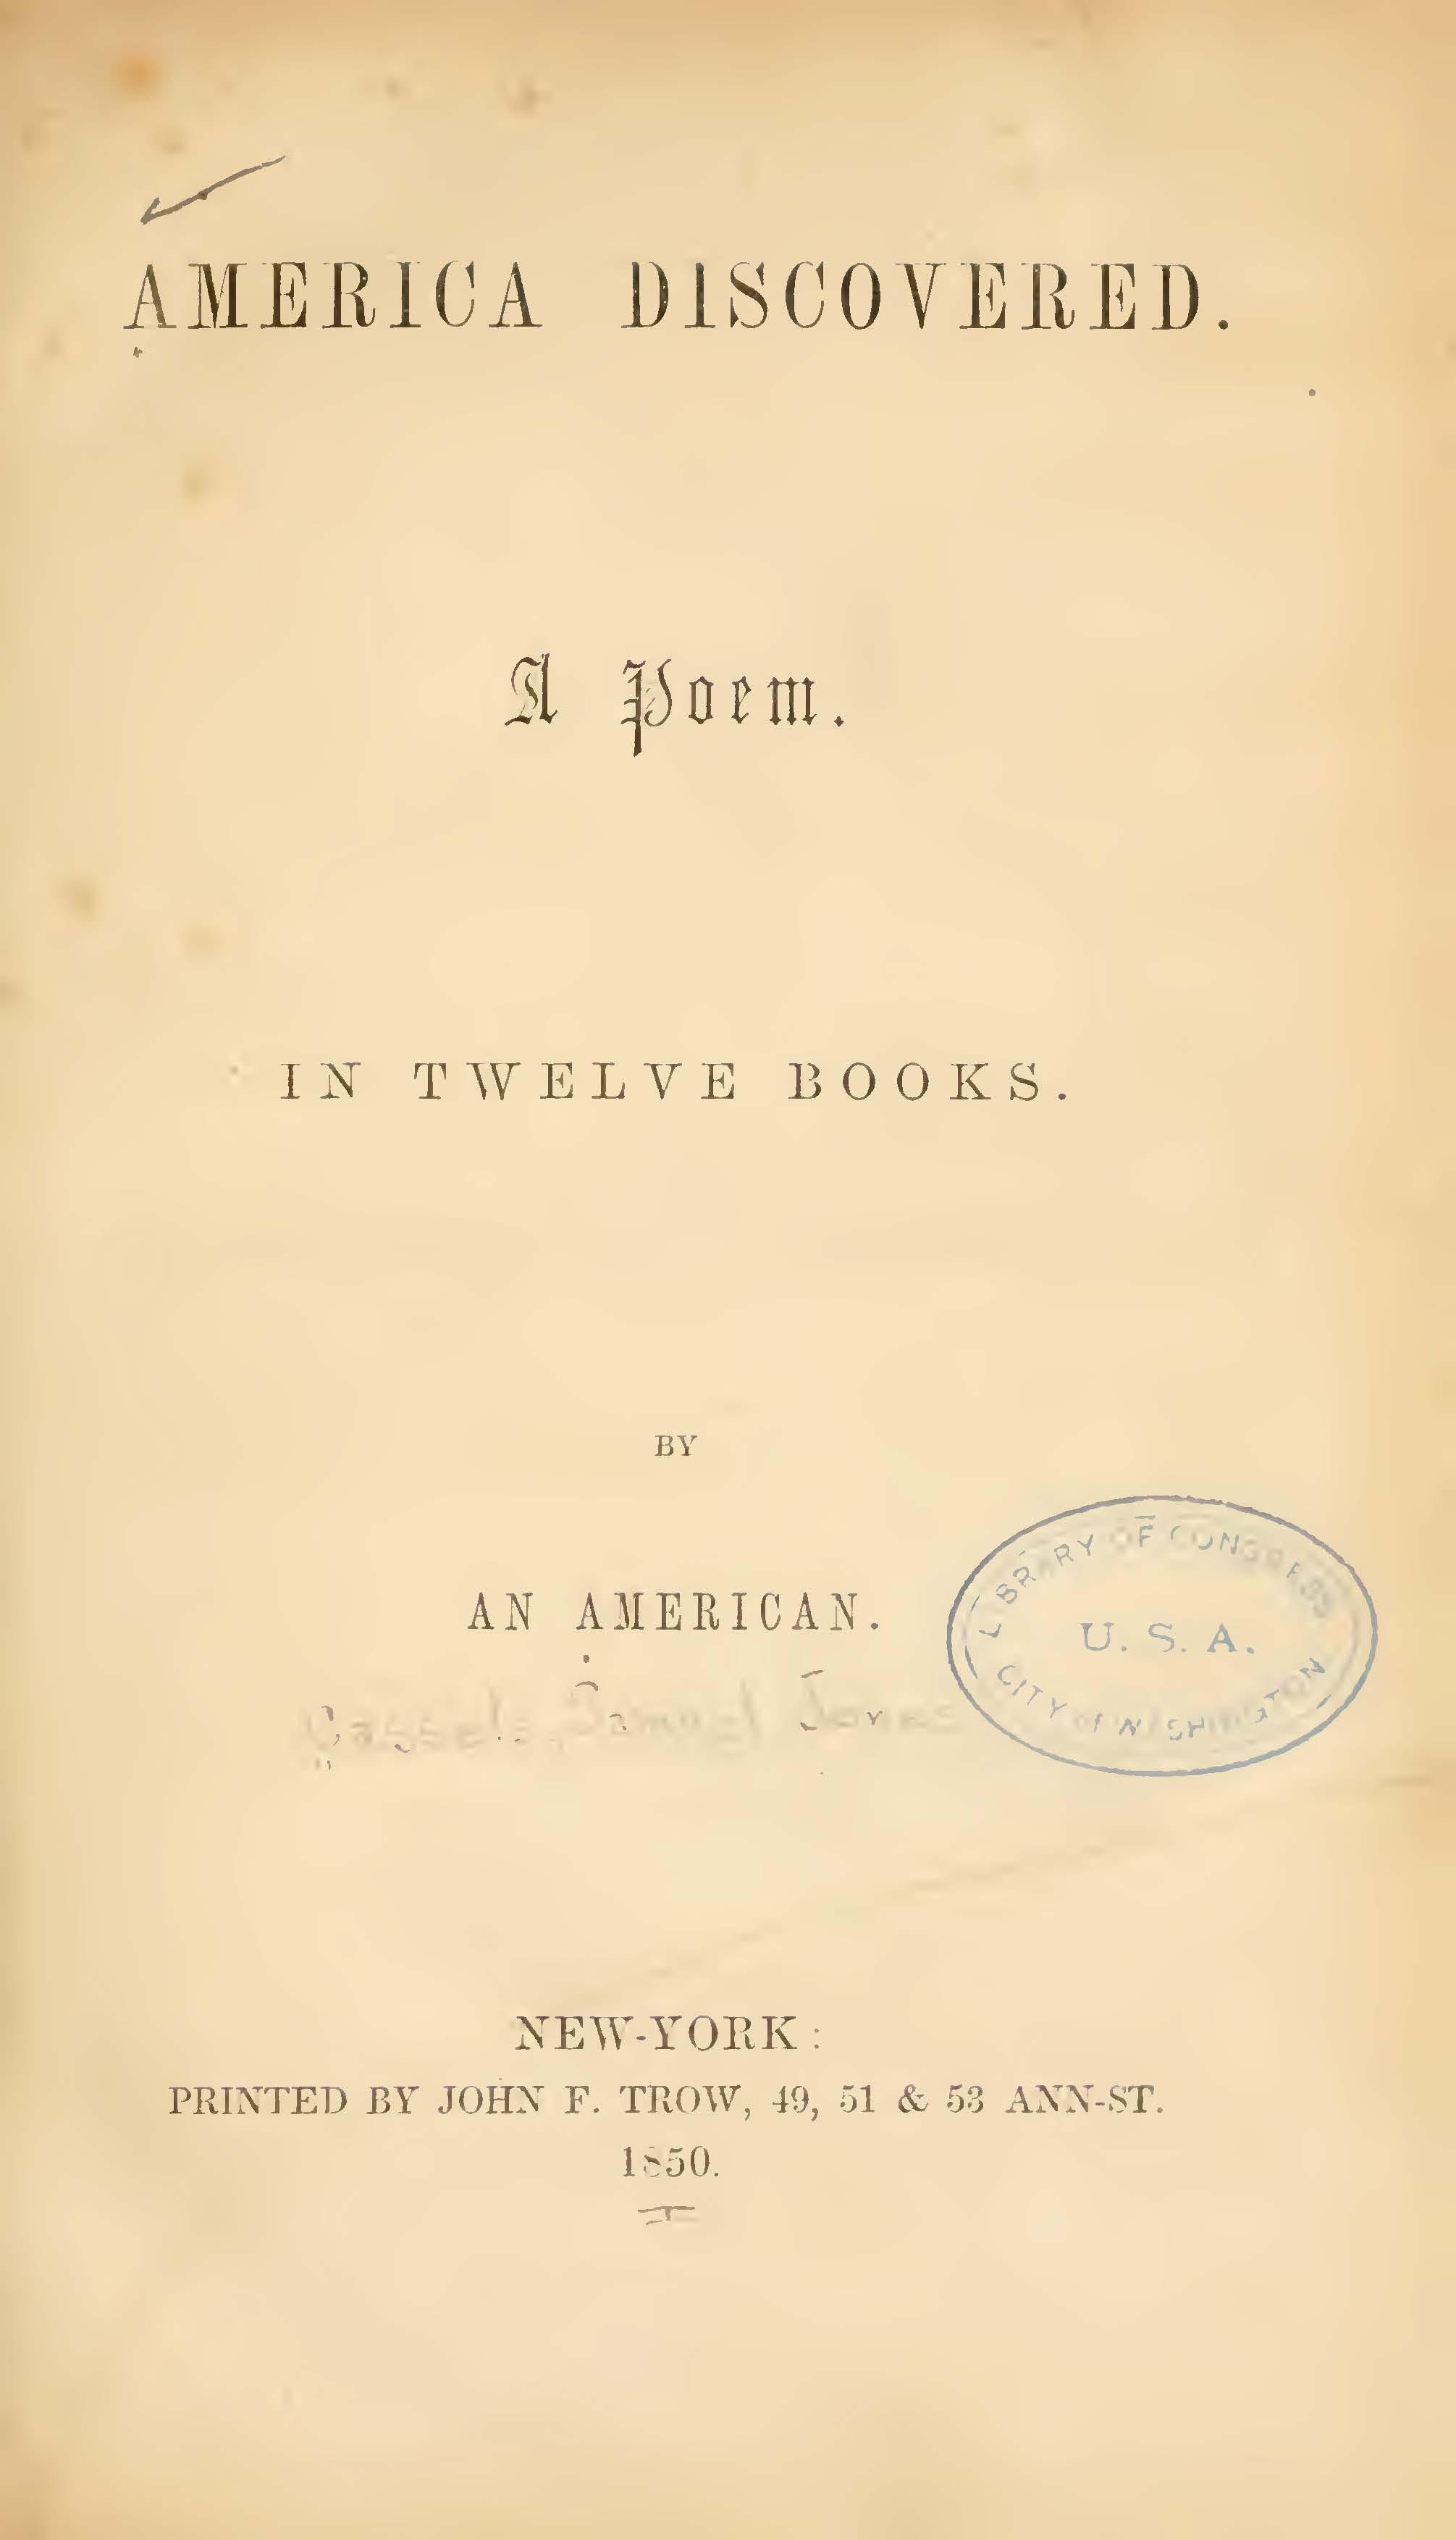 Cassells, Samuel J., America Discovered Title Page.jpg